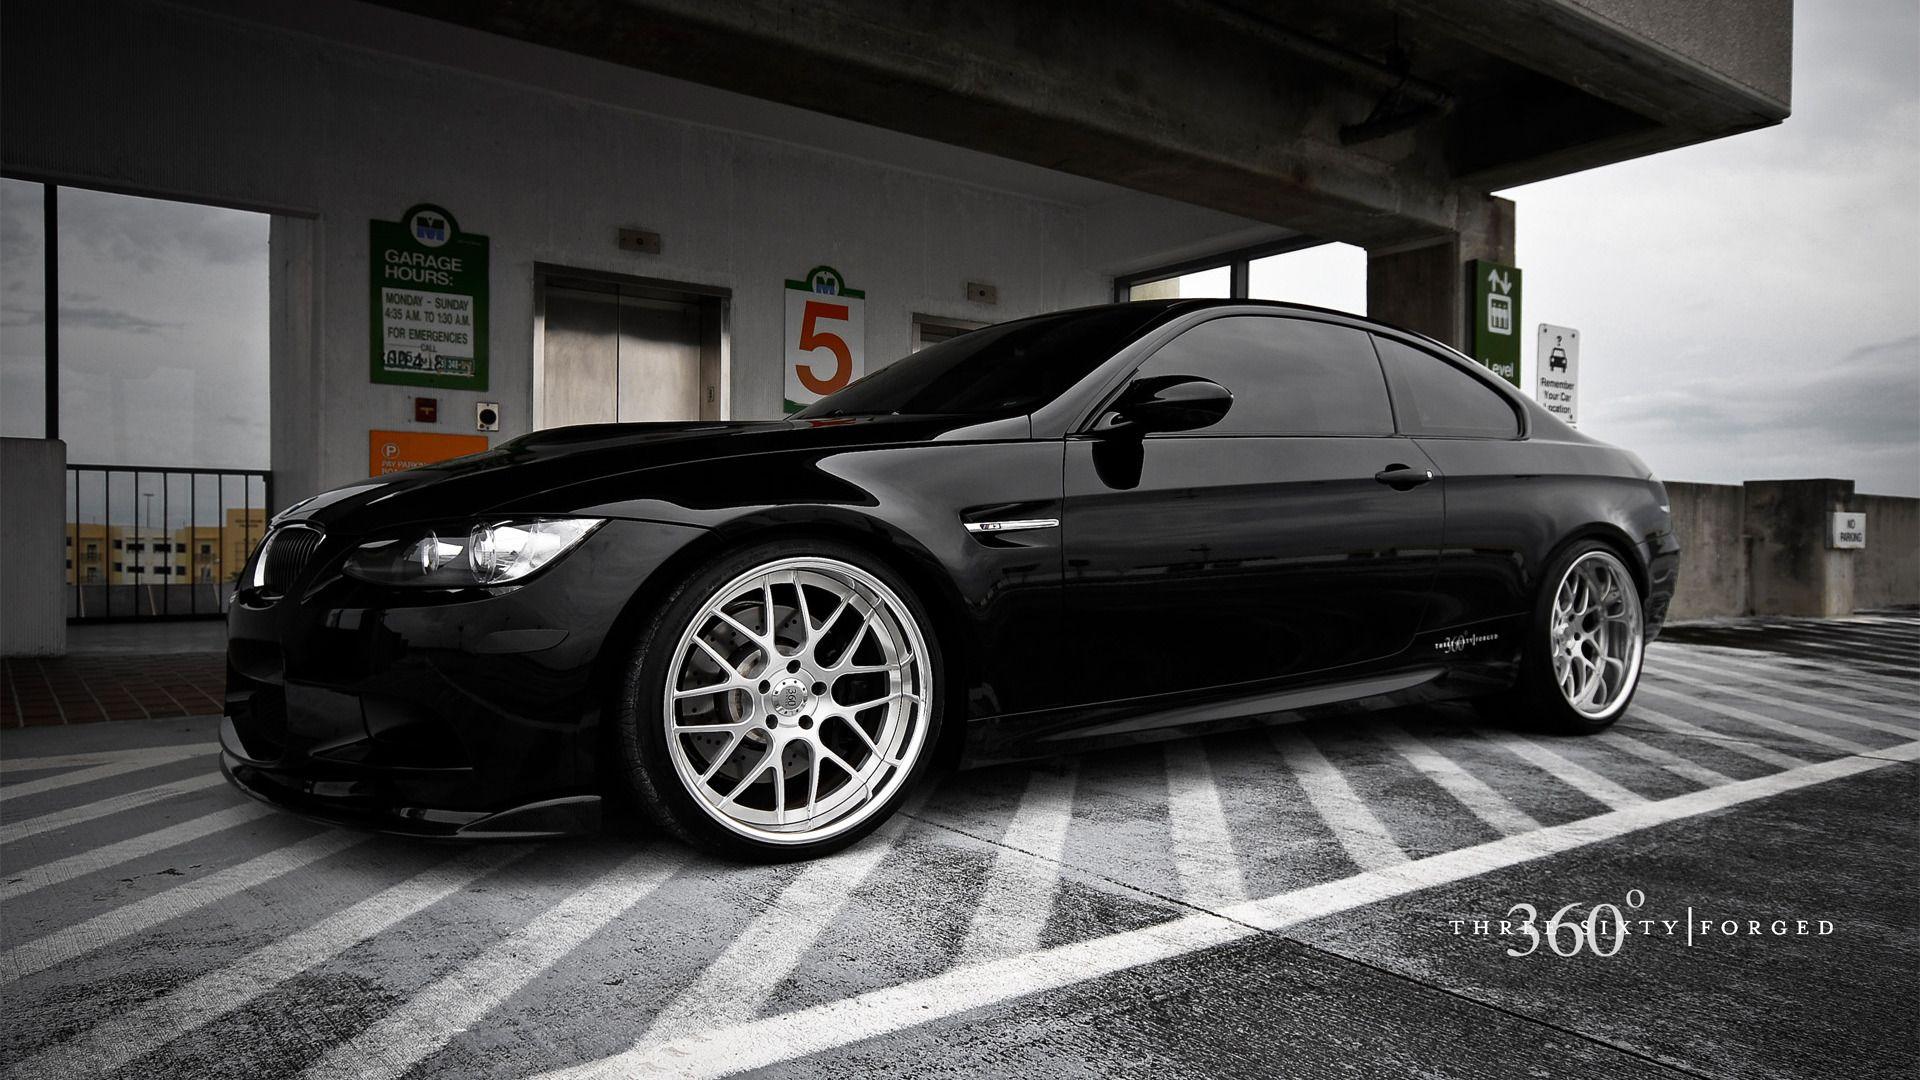 Car Photography HD Wallpaper Wallpaper Wallpaperwonder - Black bmw car